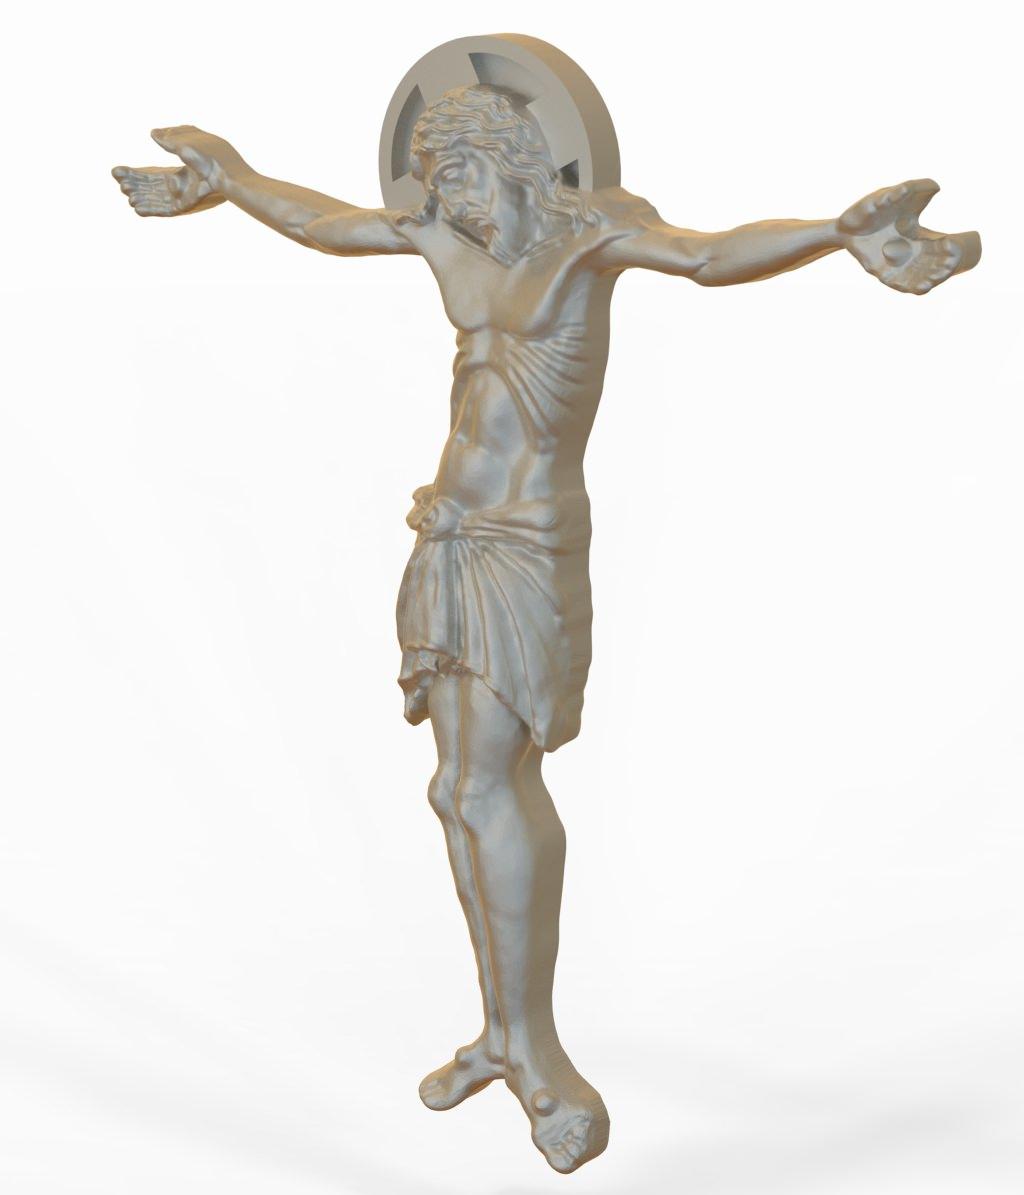 3D Model Jesus Christ STL 3D Model 3D Printable .stl